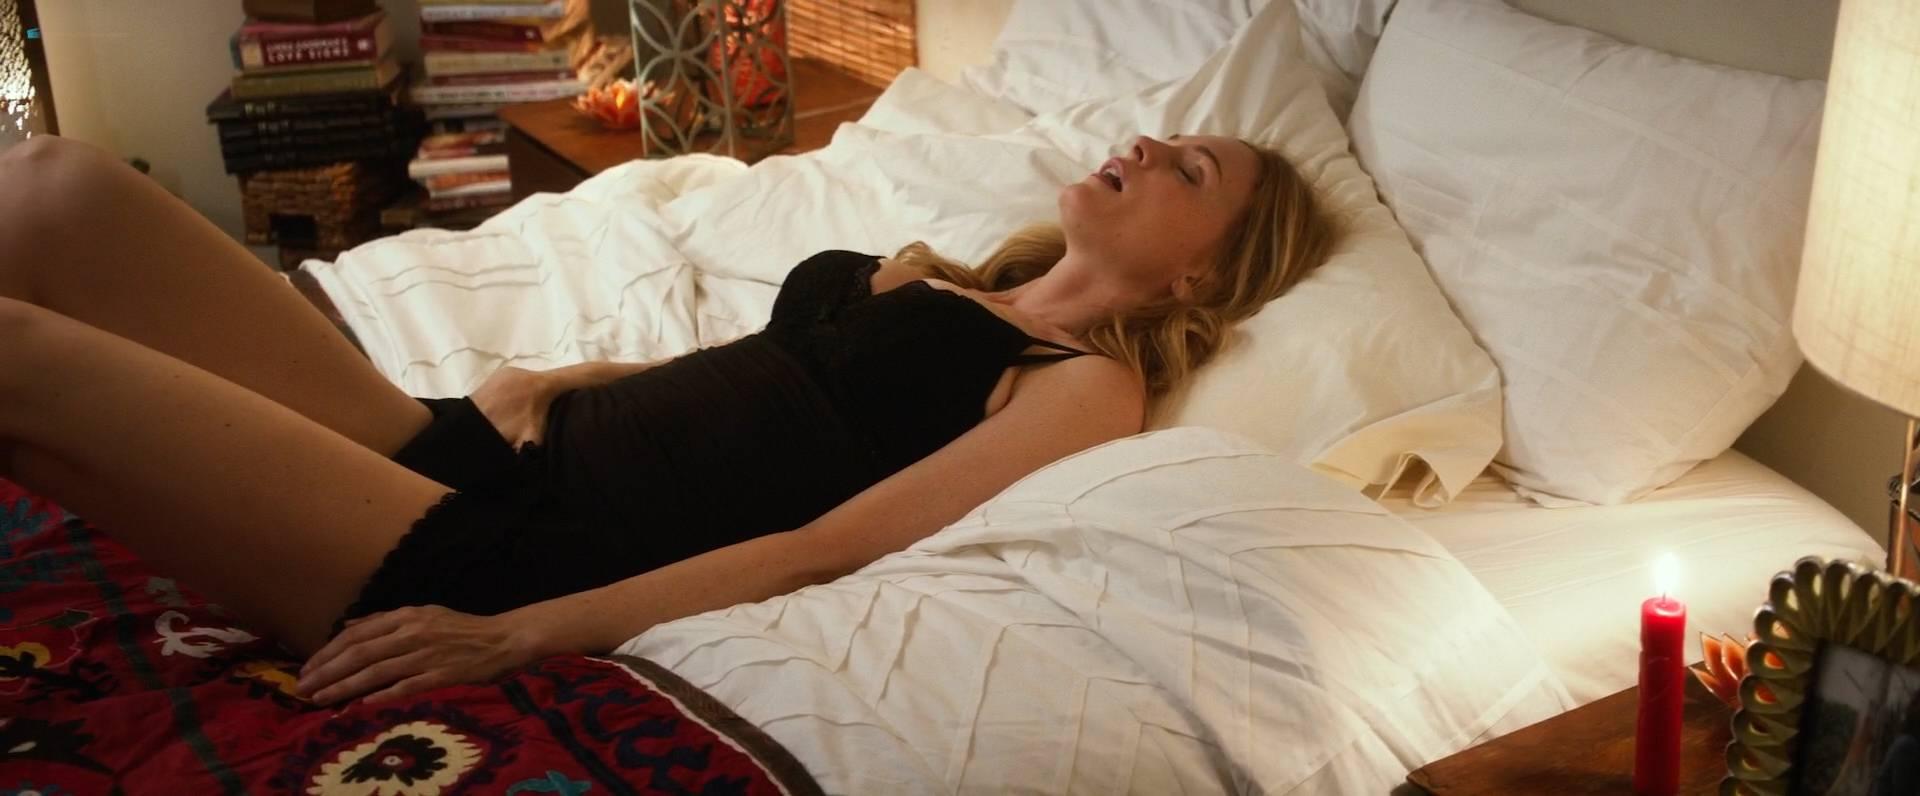 Angela Kinsey Nude heather graham nude sex angela kinsey nude butt stephanie